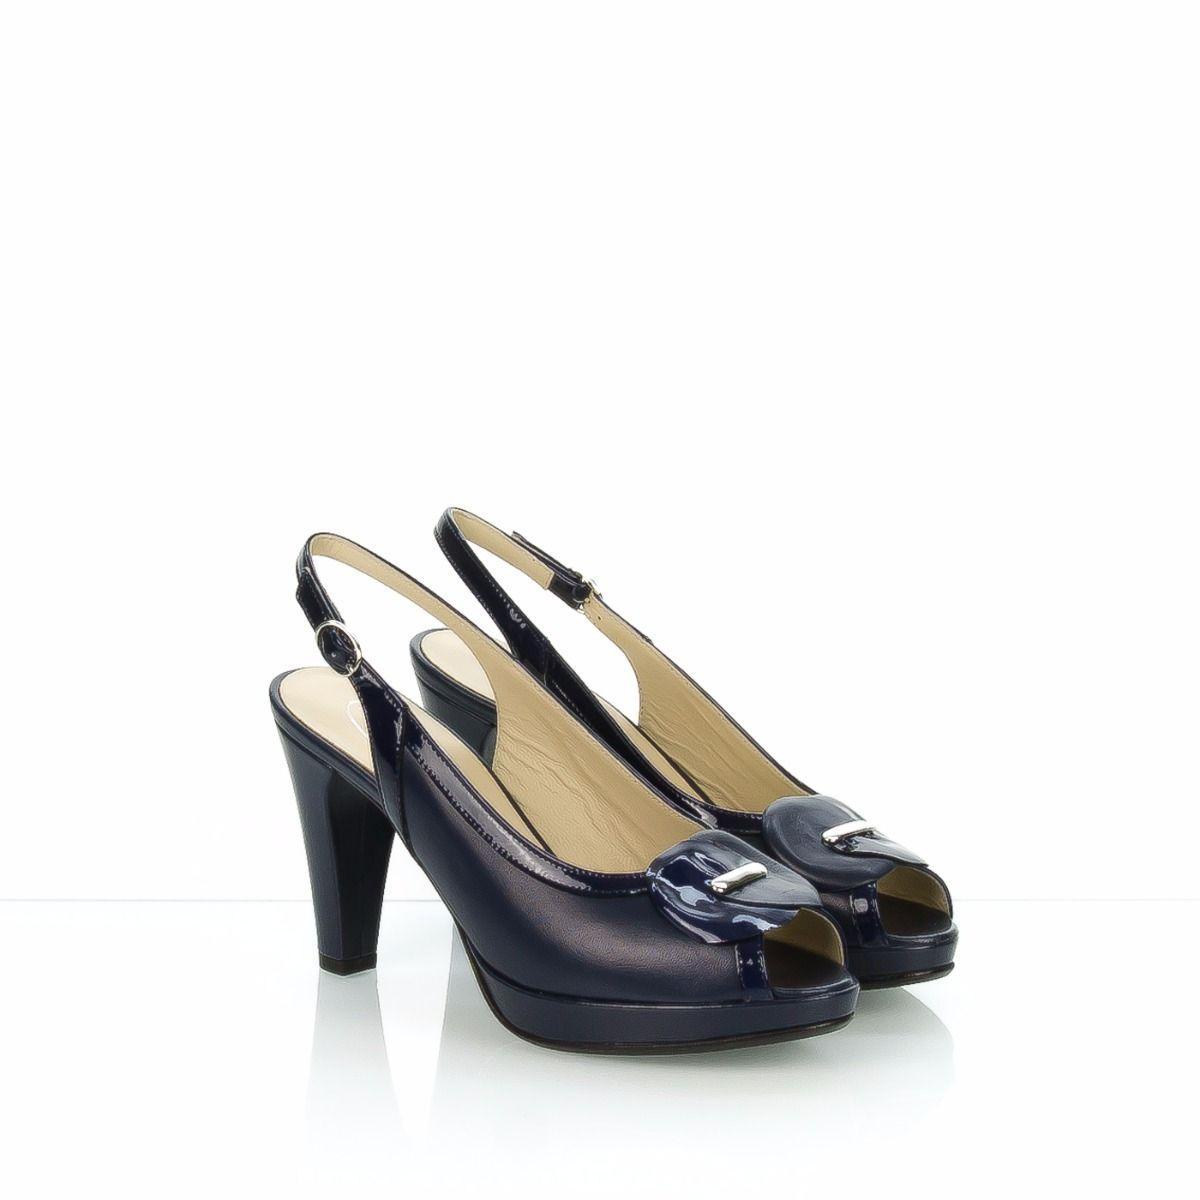 Sandalo 4081 Donna Blu Pelle Panizzolo Antonio Yb7gvf6y